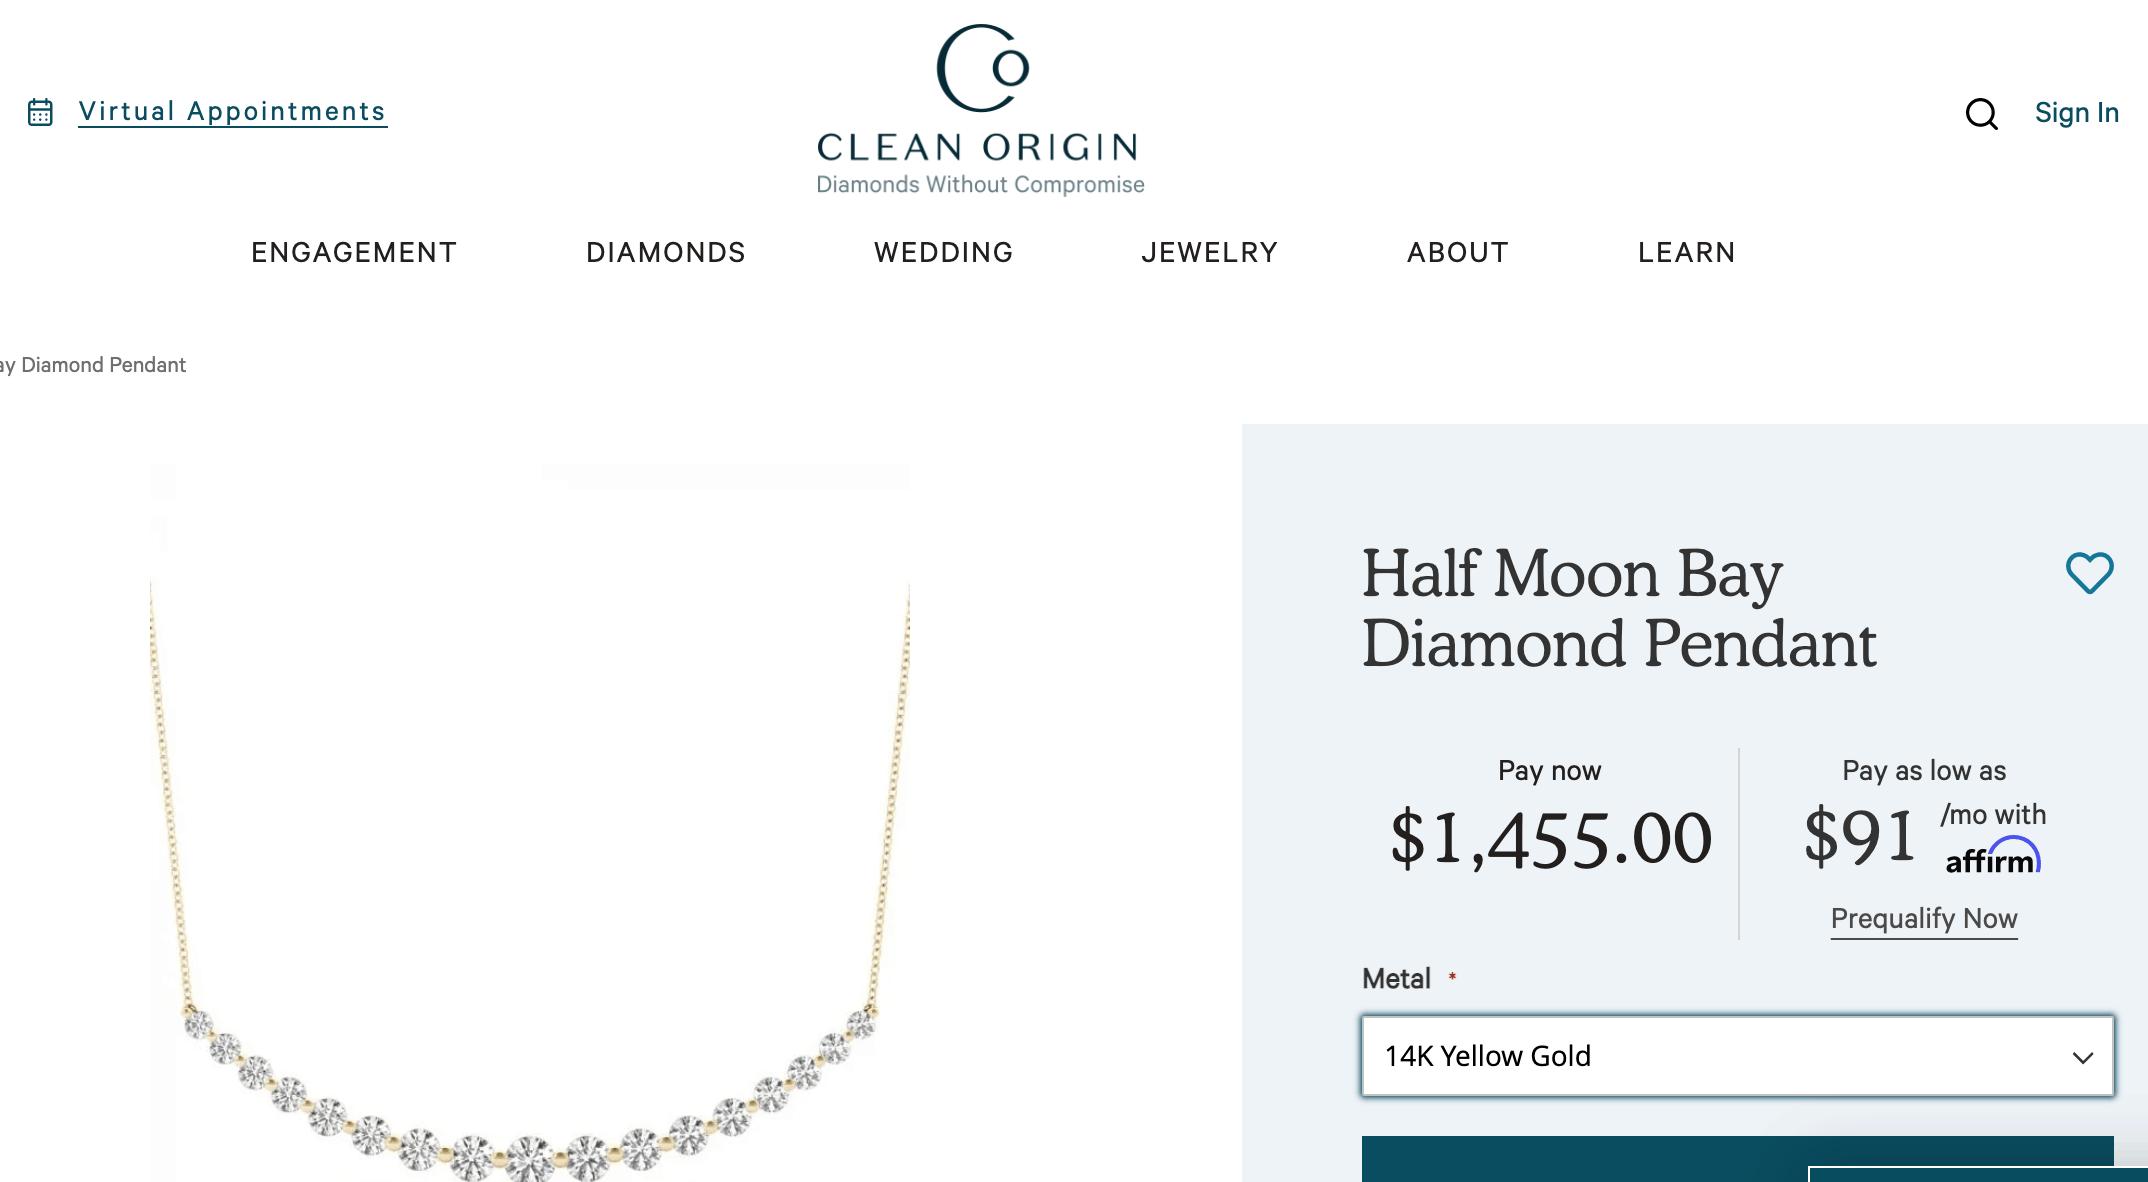 Half Moon Bay Diamond Pendant